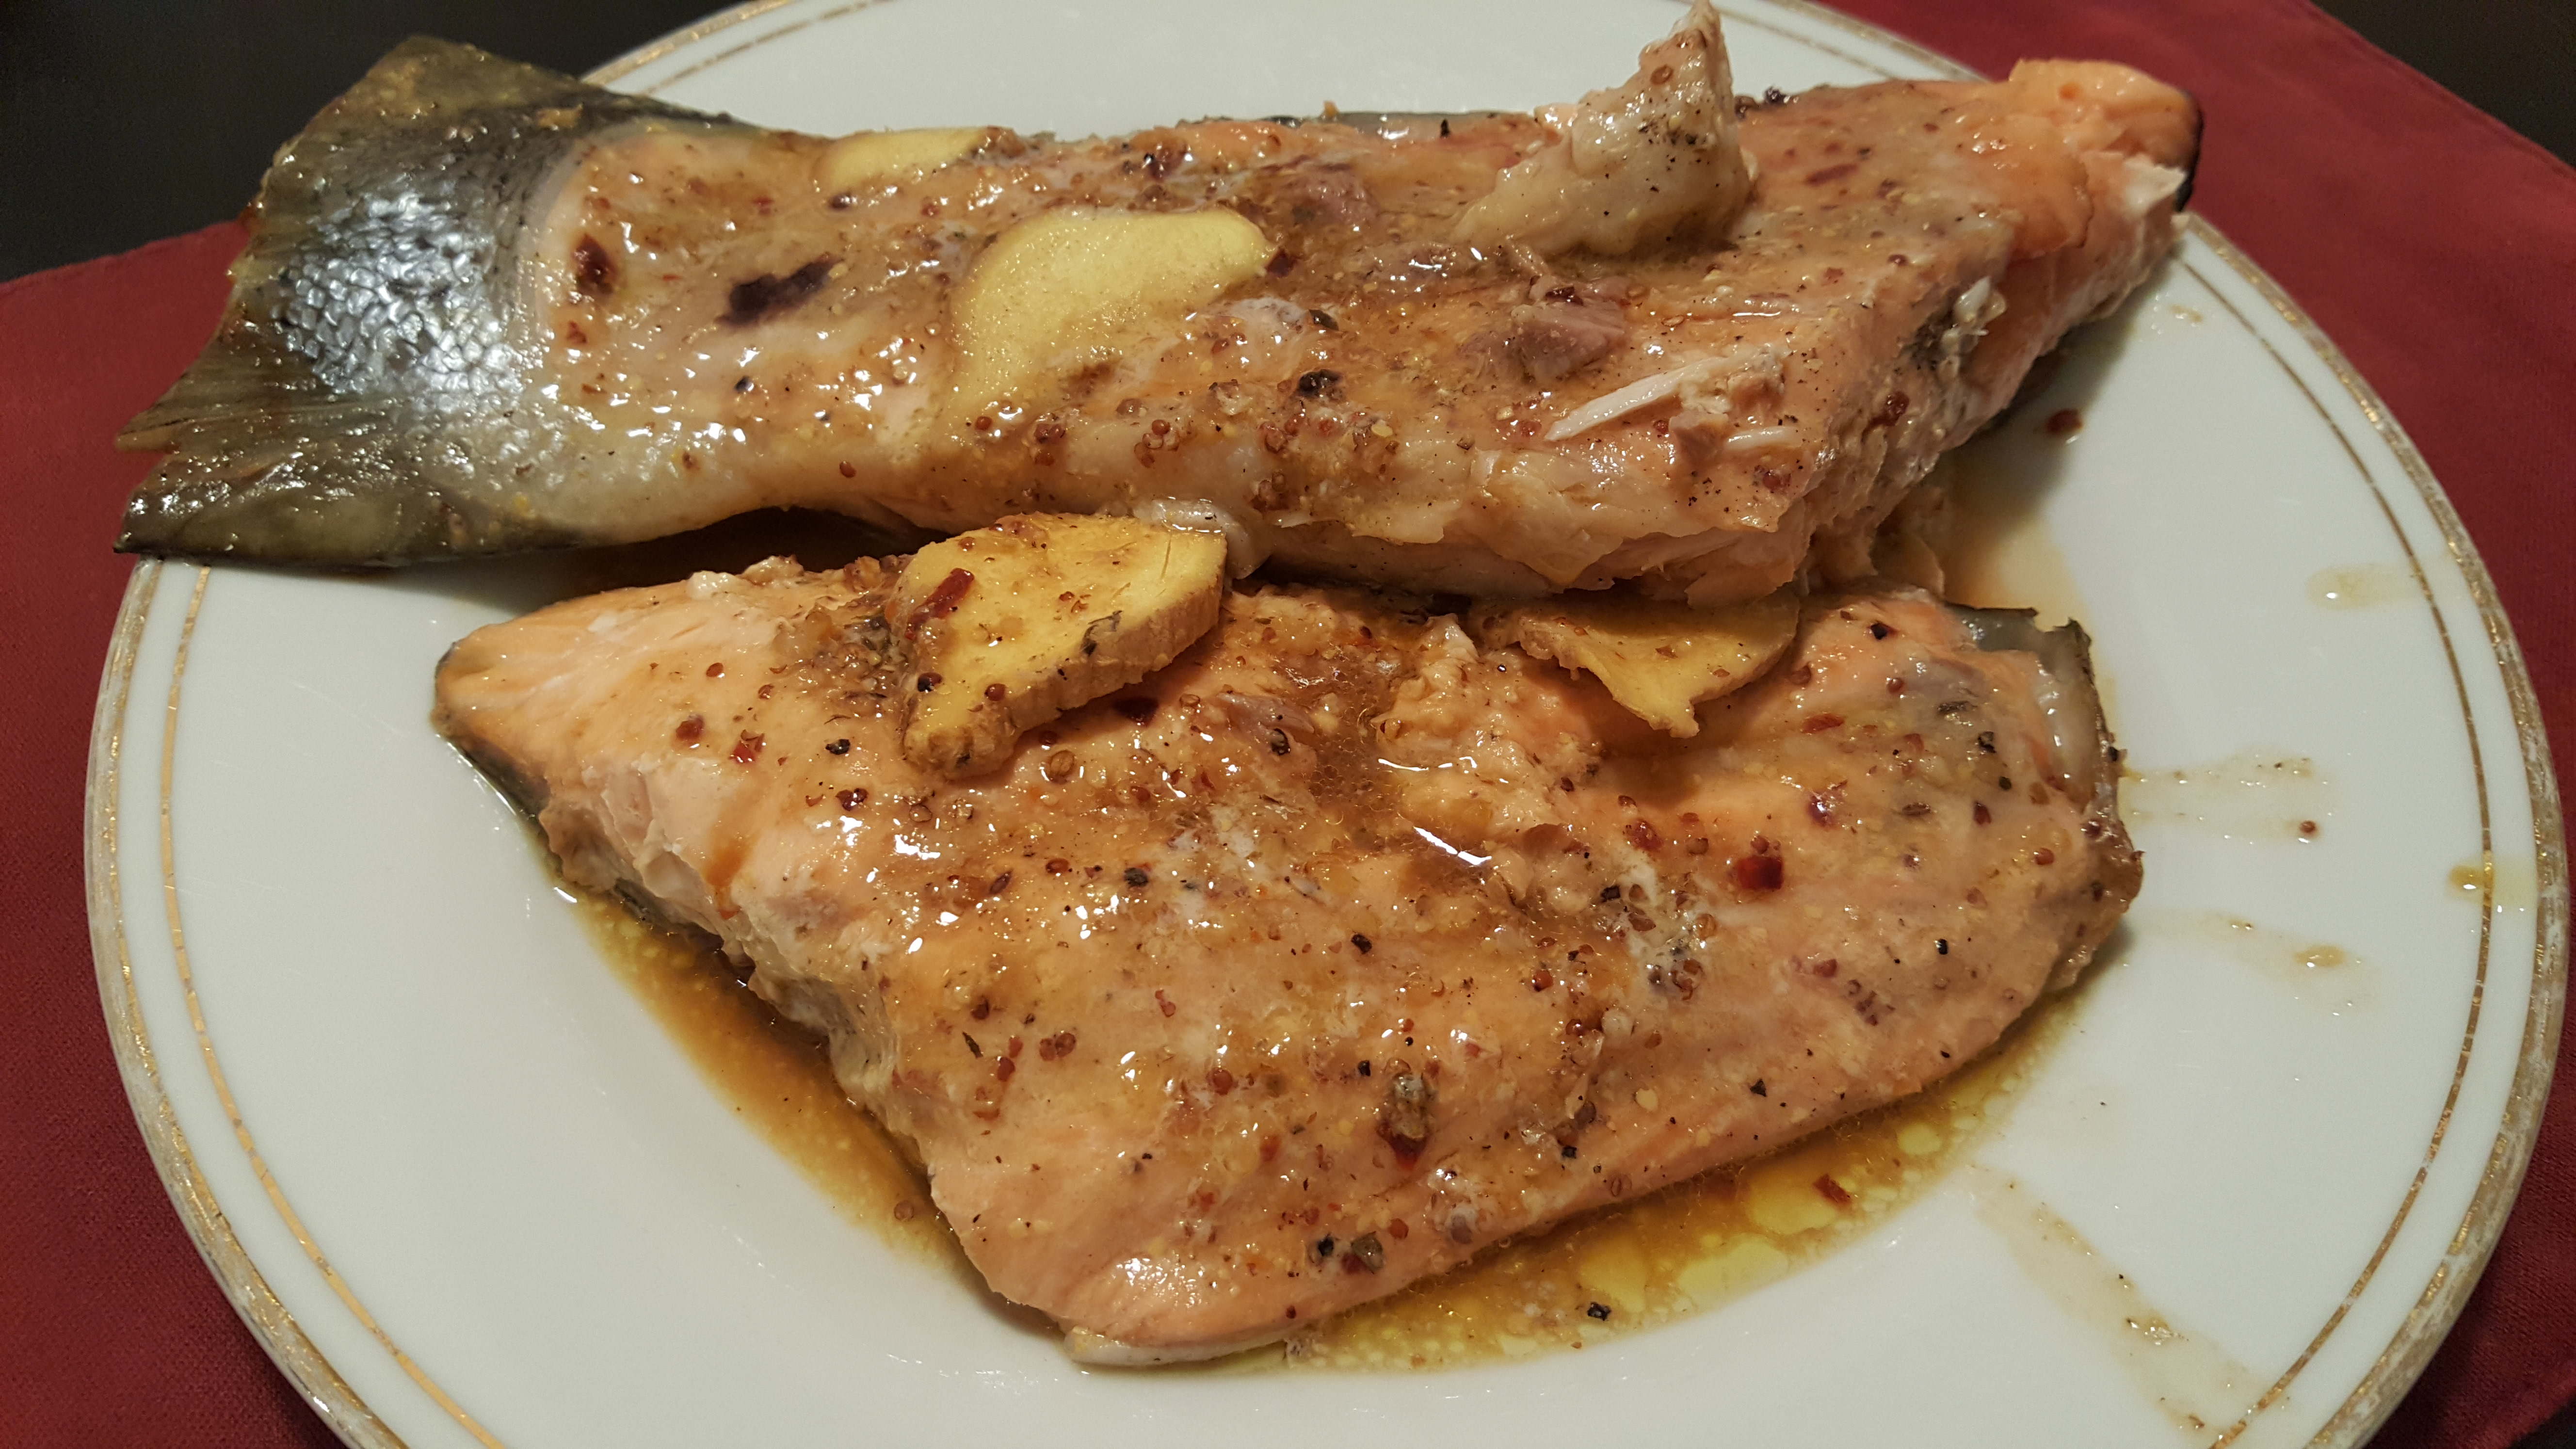 Sunday Night Baked Salmon